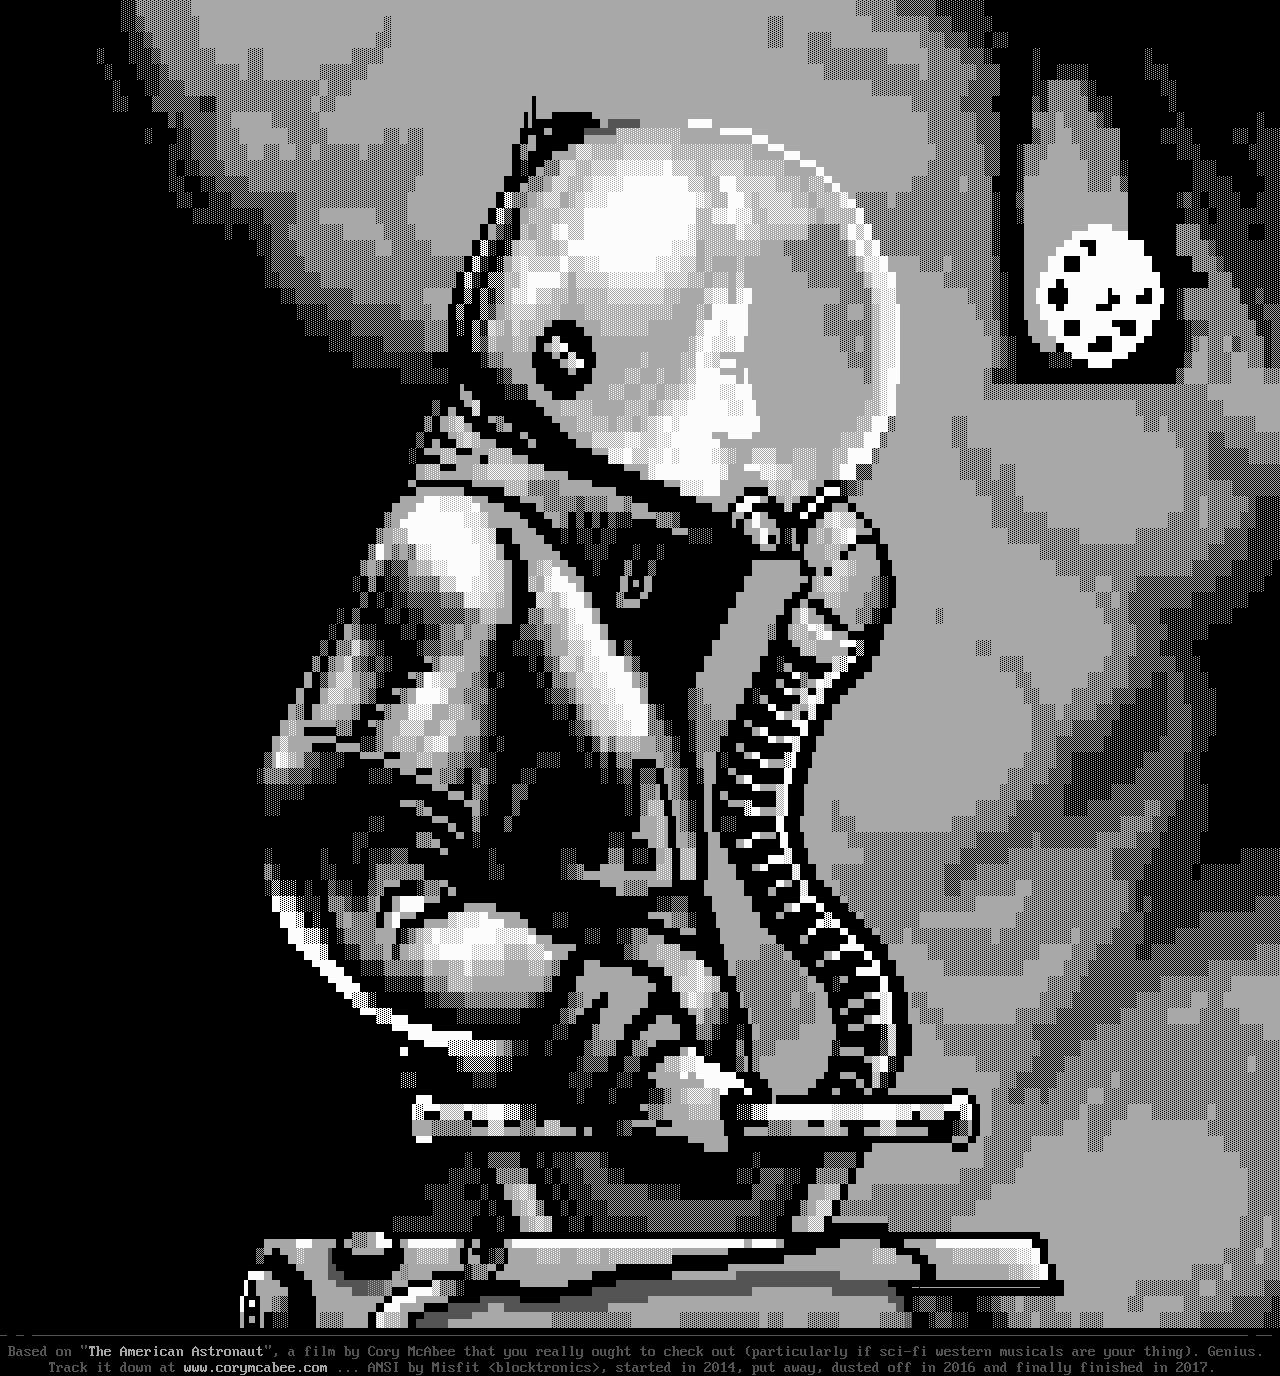 misfit, astronaut, grayscale, gray, white, black, helmet, smoke, human, man